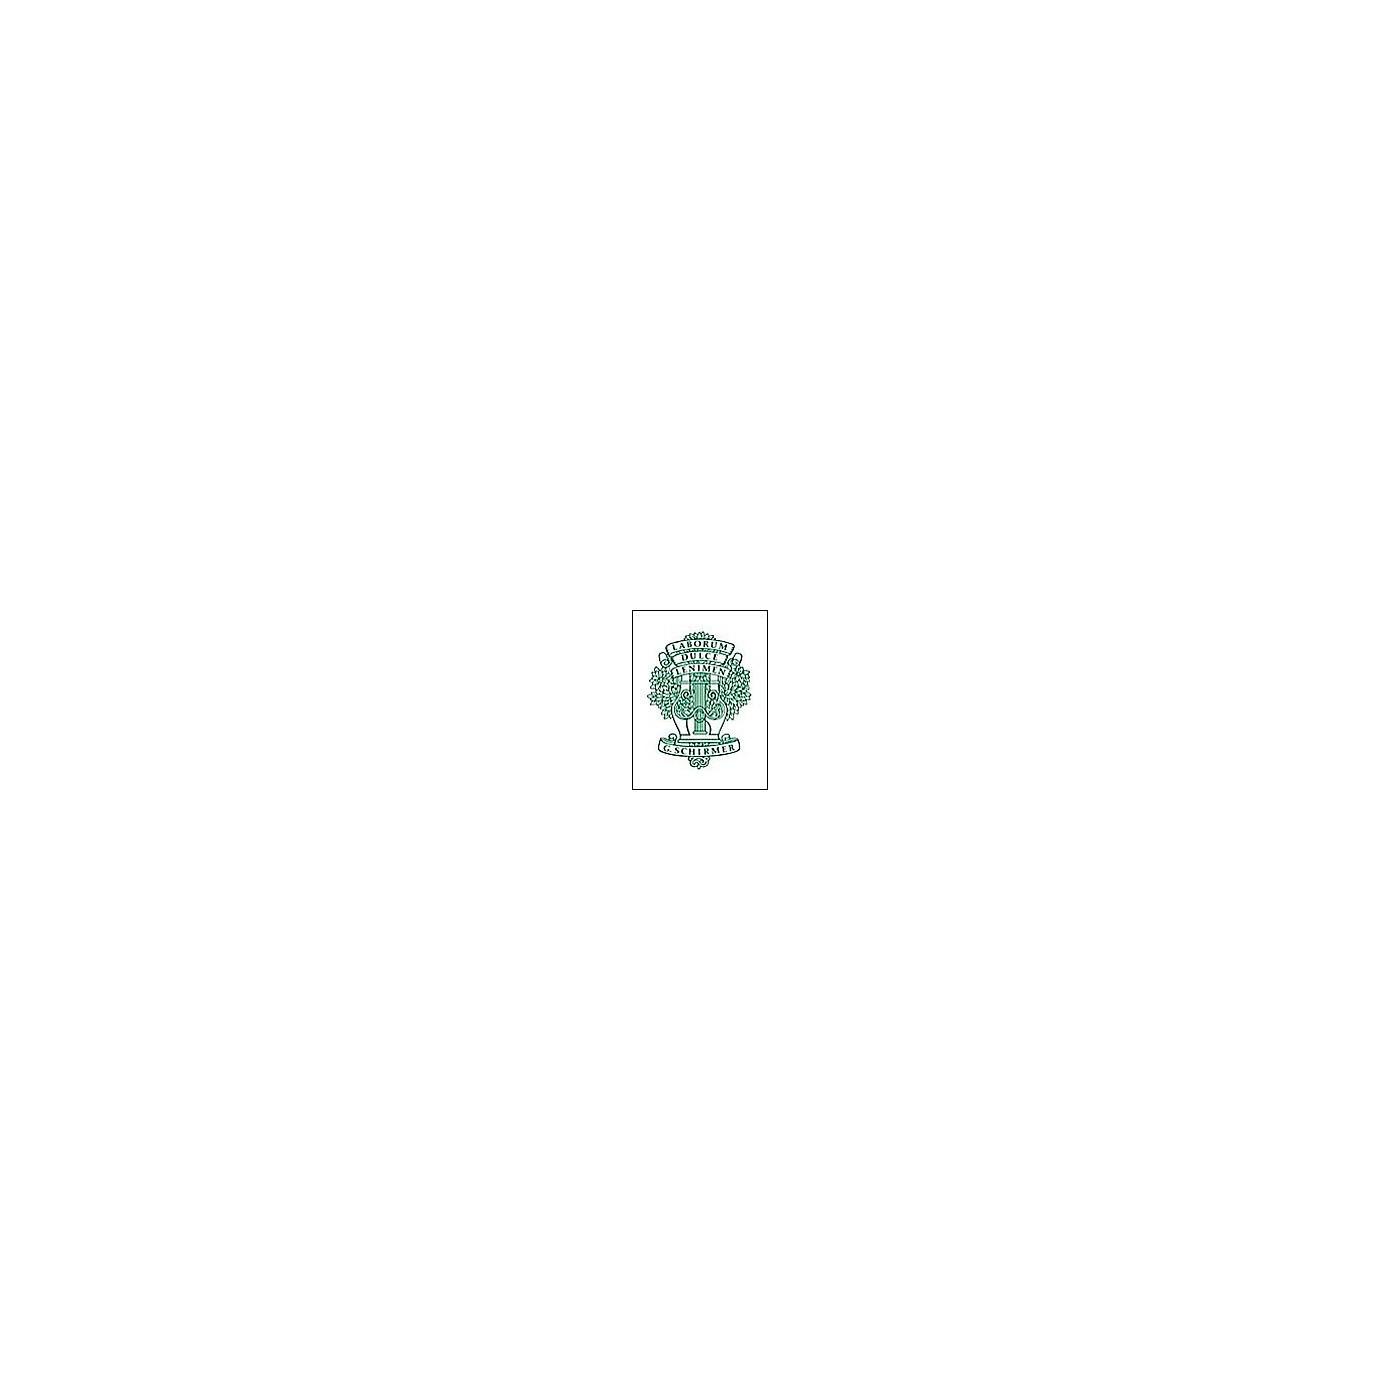 G. Schirmer 24 Progressive Vocalises Op. 85 Book 1 by Panofka H P thumbnail